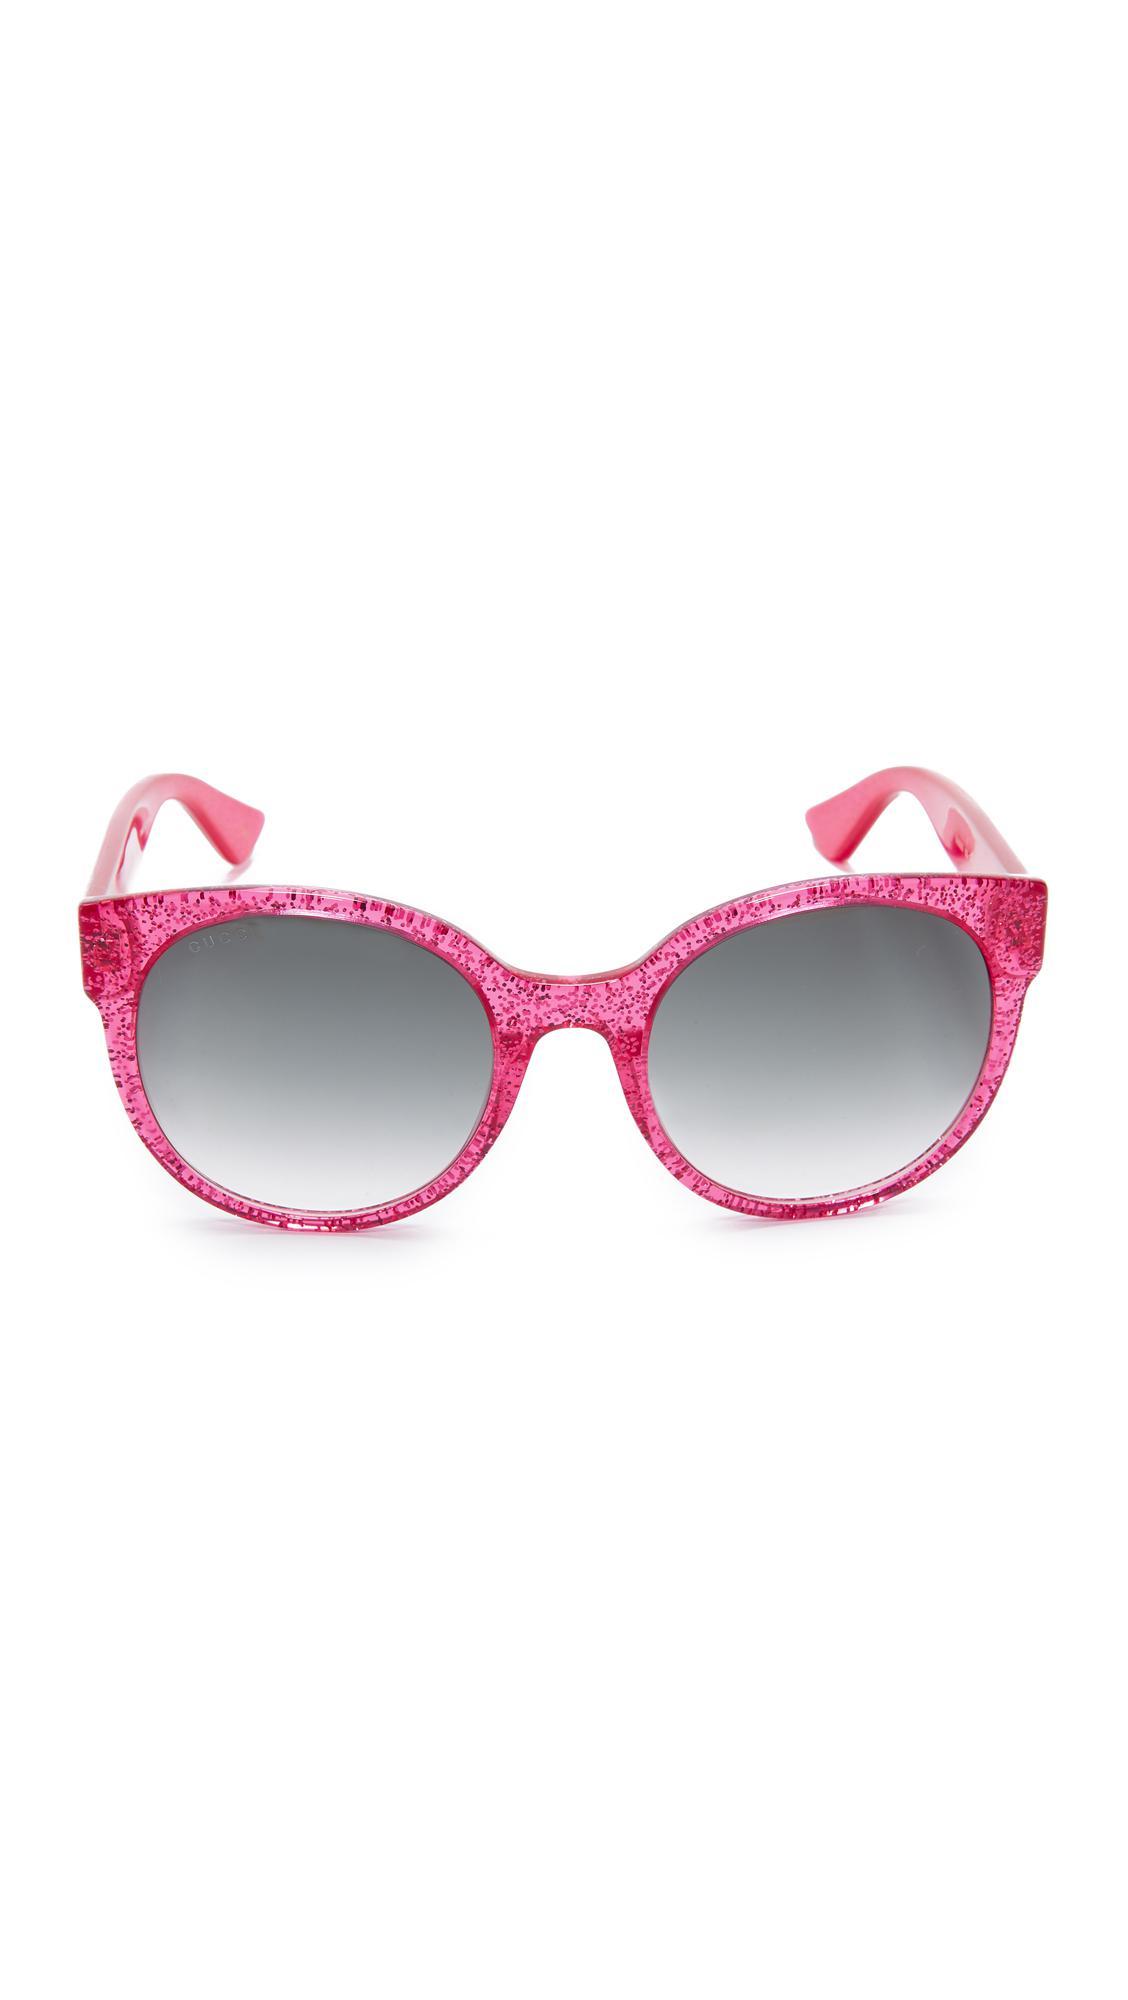 b1b678bc0c8 Lyst - Gucci Urban Pop Round Sunglasses in Pink